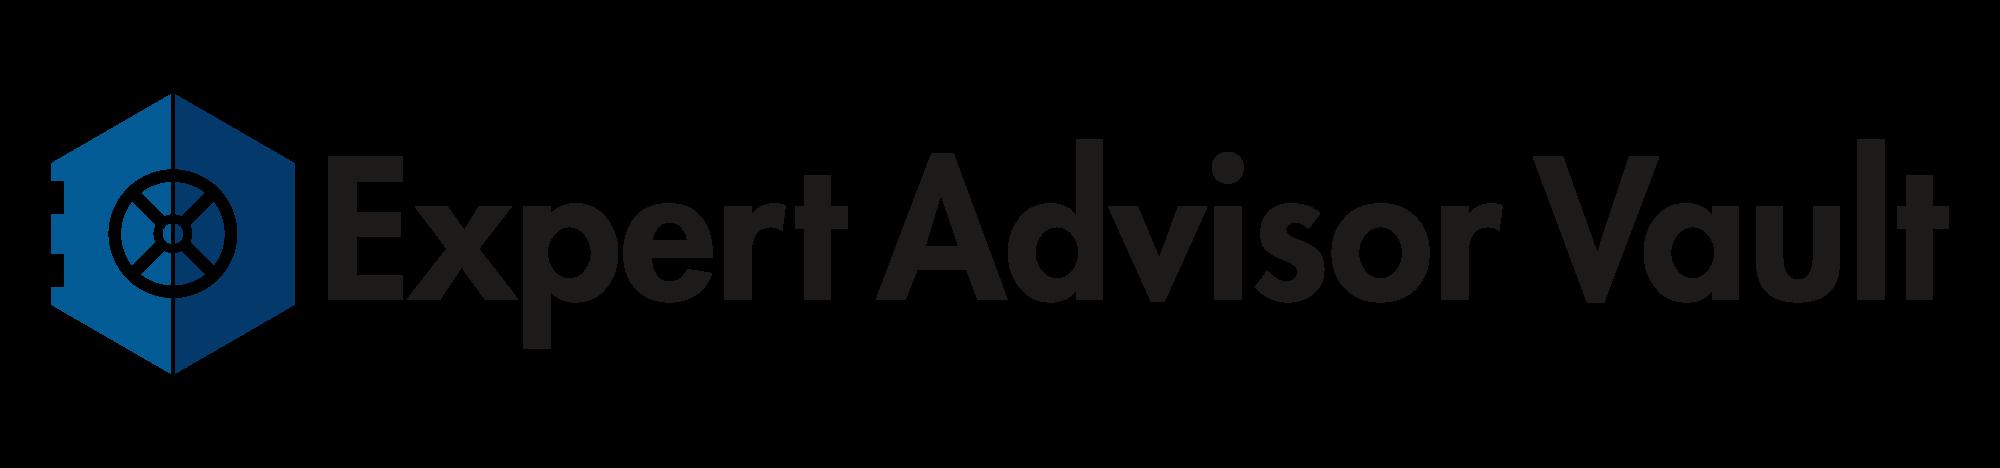 Expert Advisor Vault